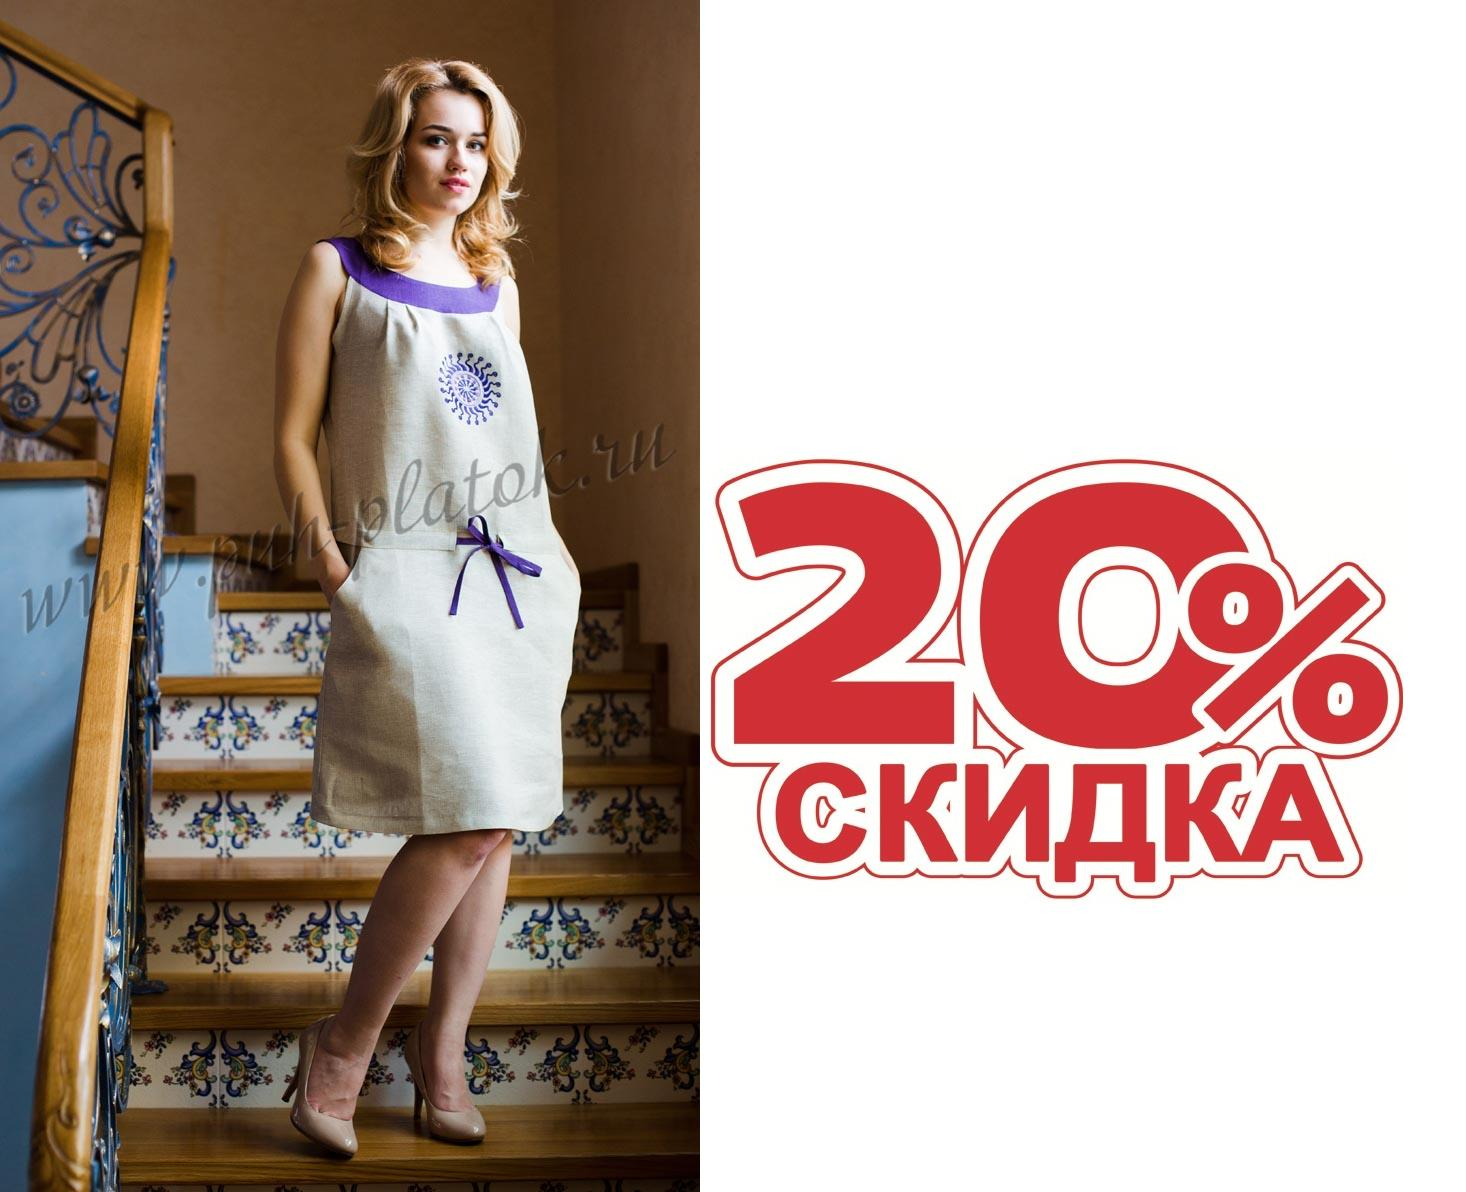 � � � - 17, ��� ������ ����� � �������! ������ ����� ��� ��������, �� ������ ������� ���������� � ����������! �� ��� ������ ������ 20%!!! ������, ������, ������, ����� � ����. �-�� 44-64. ��� �����!